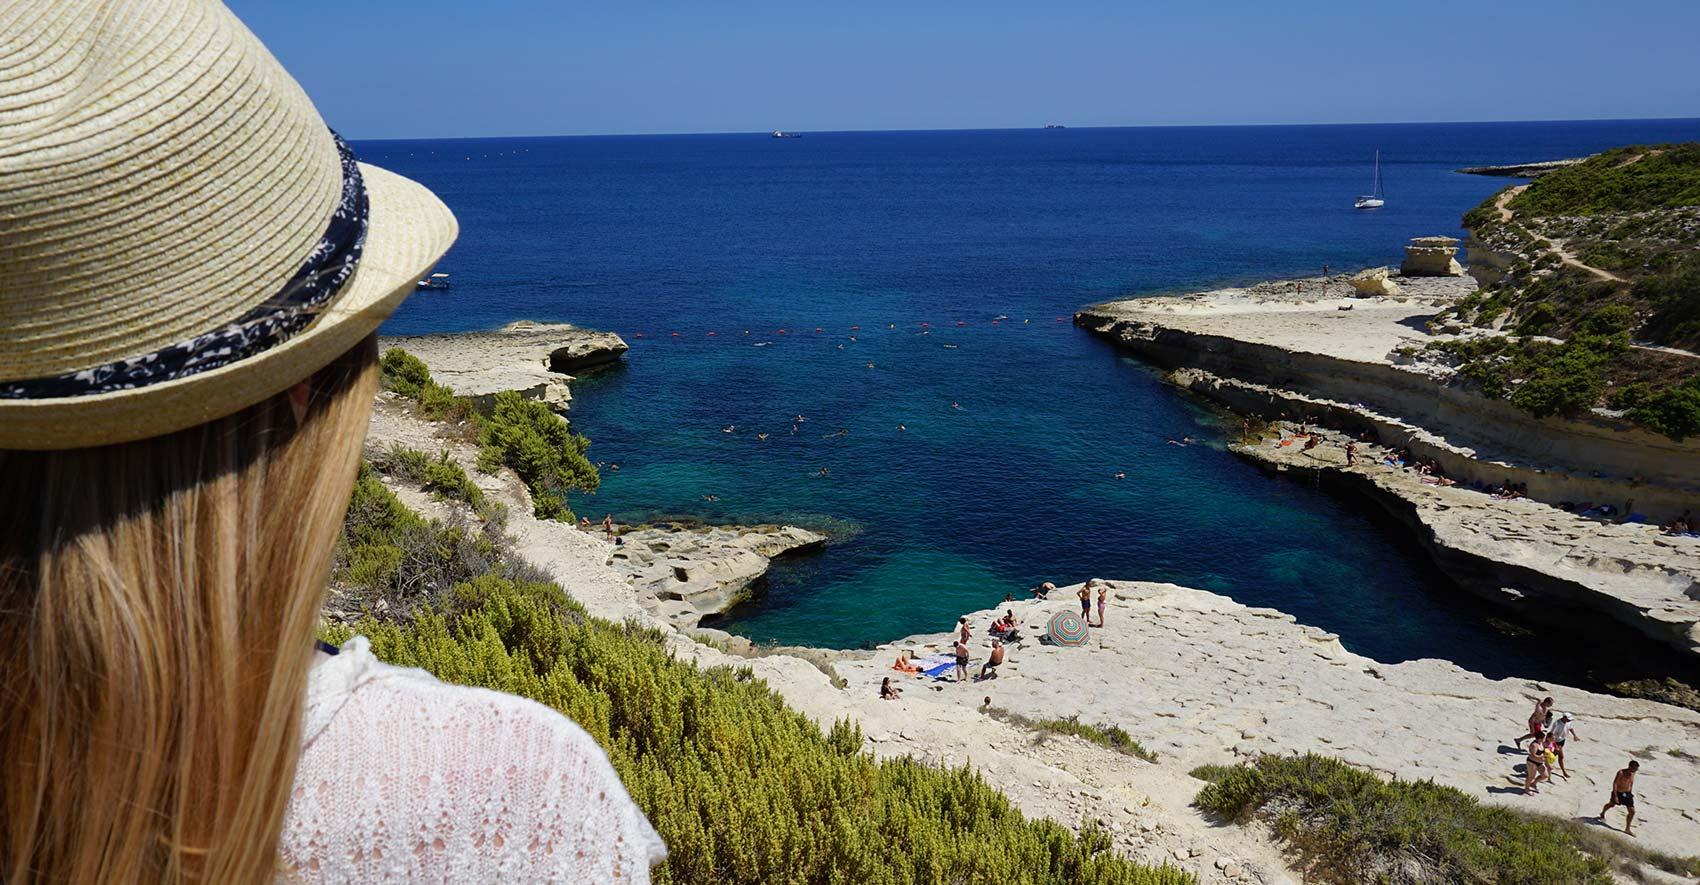 Vlogi z Malty już są!